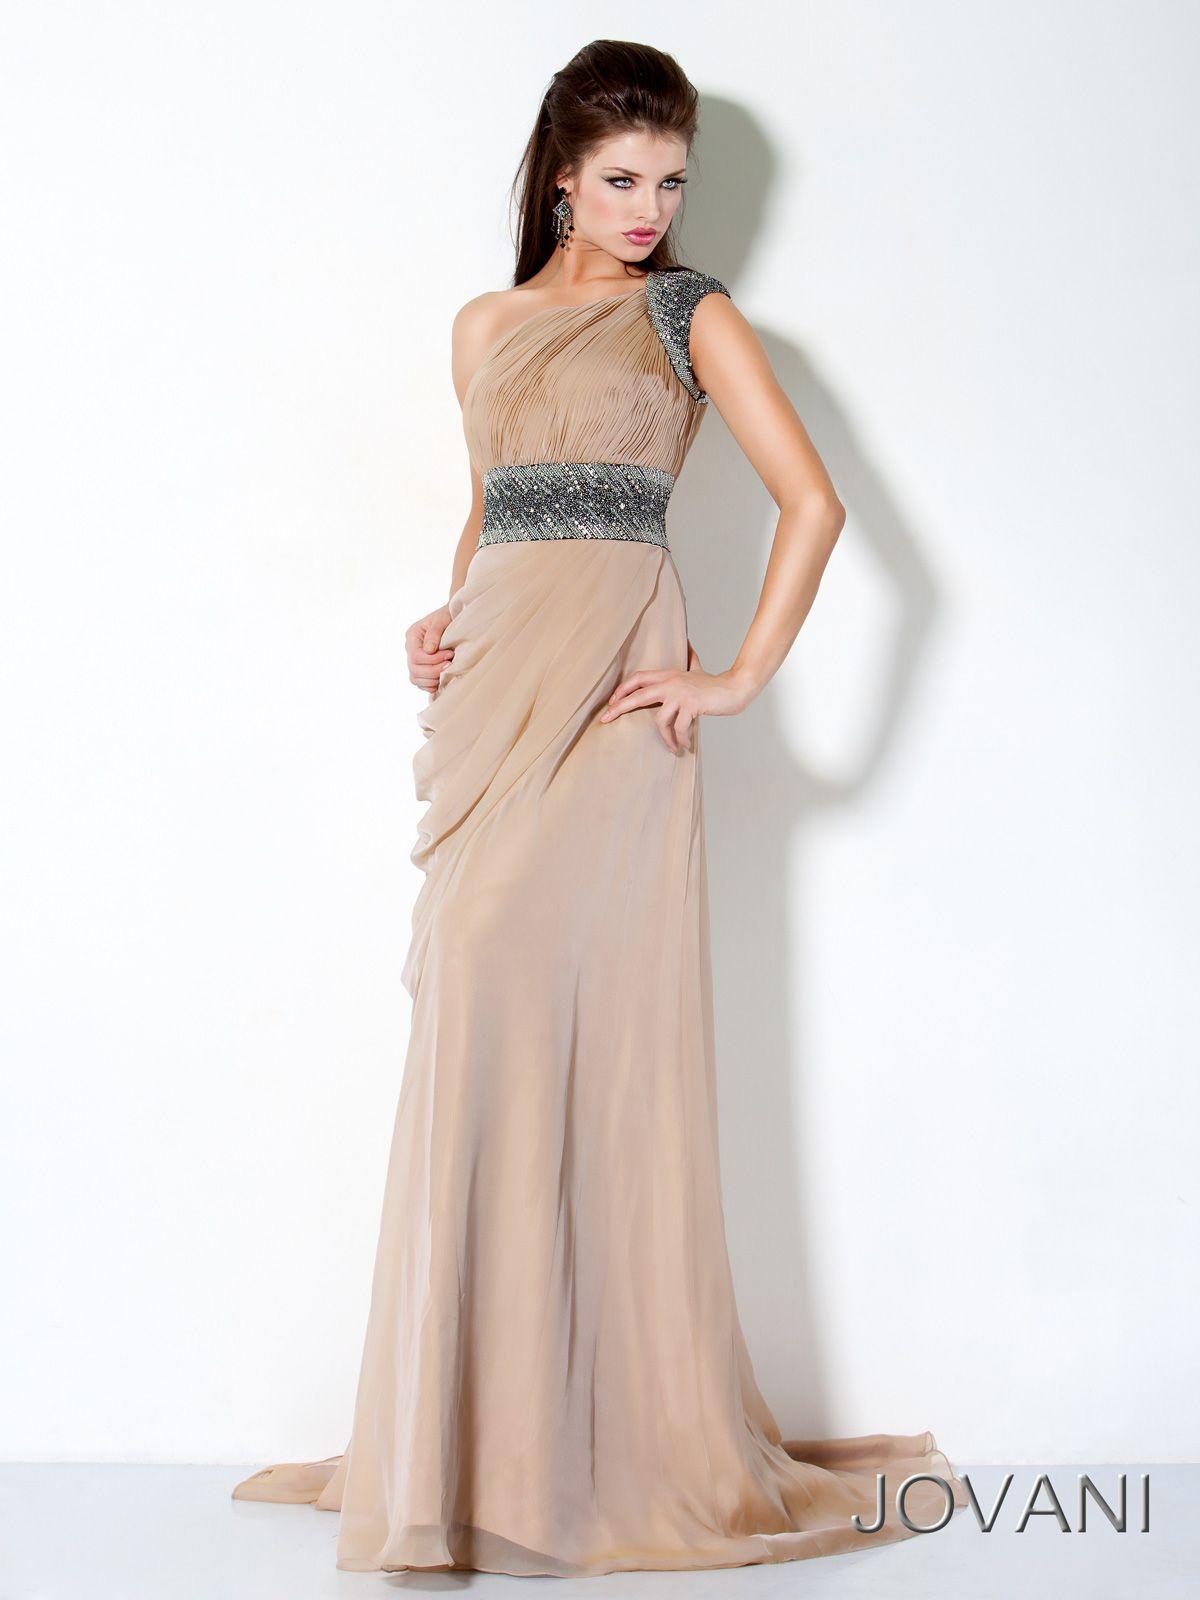 Roman Goddess silk prom evening dress Jovani 3012. Be the ...